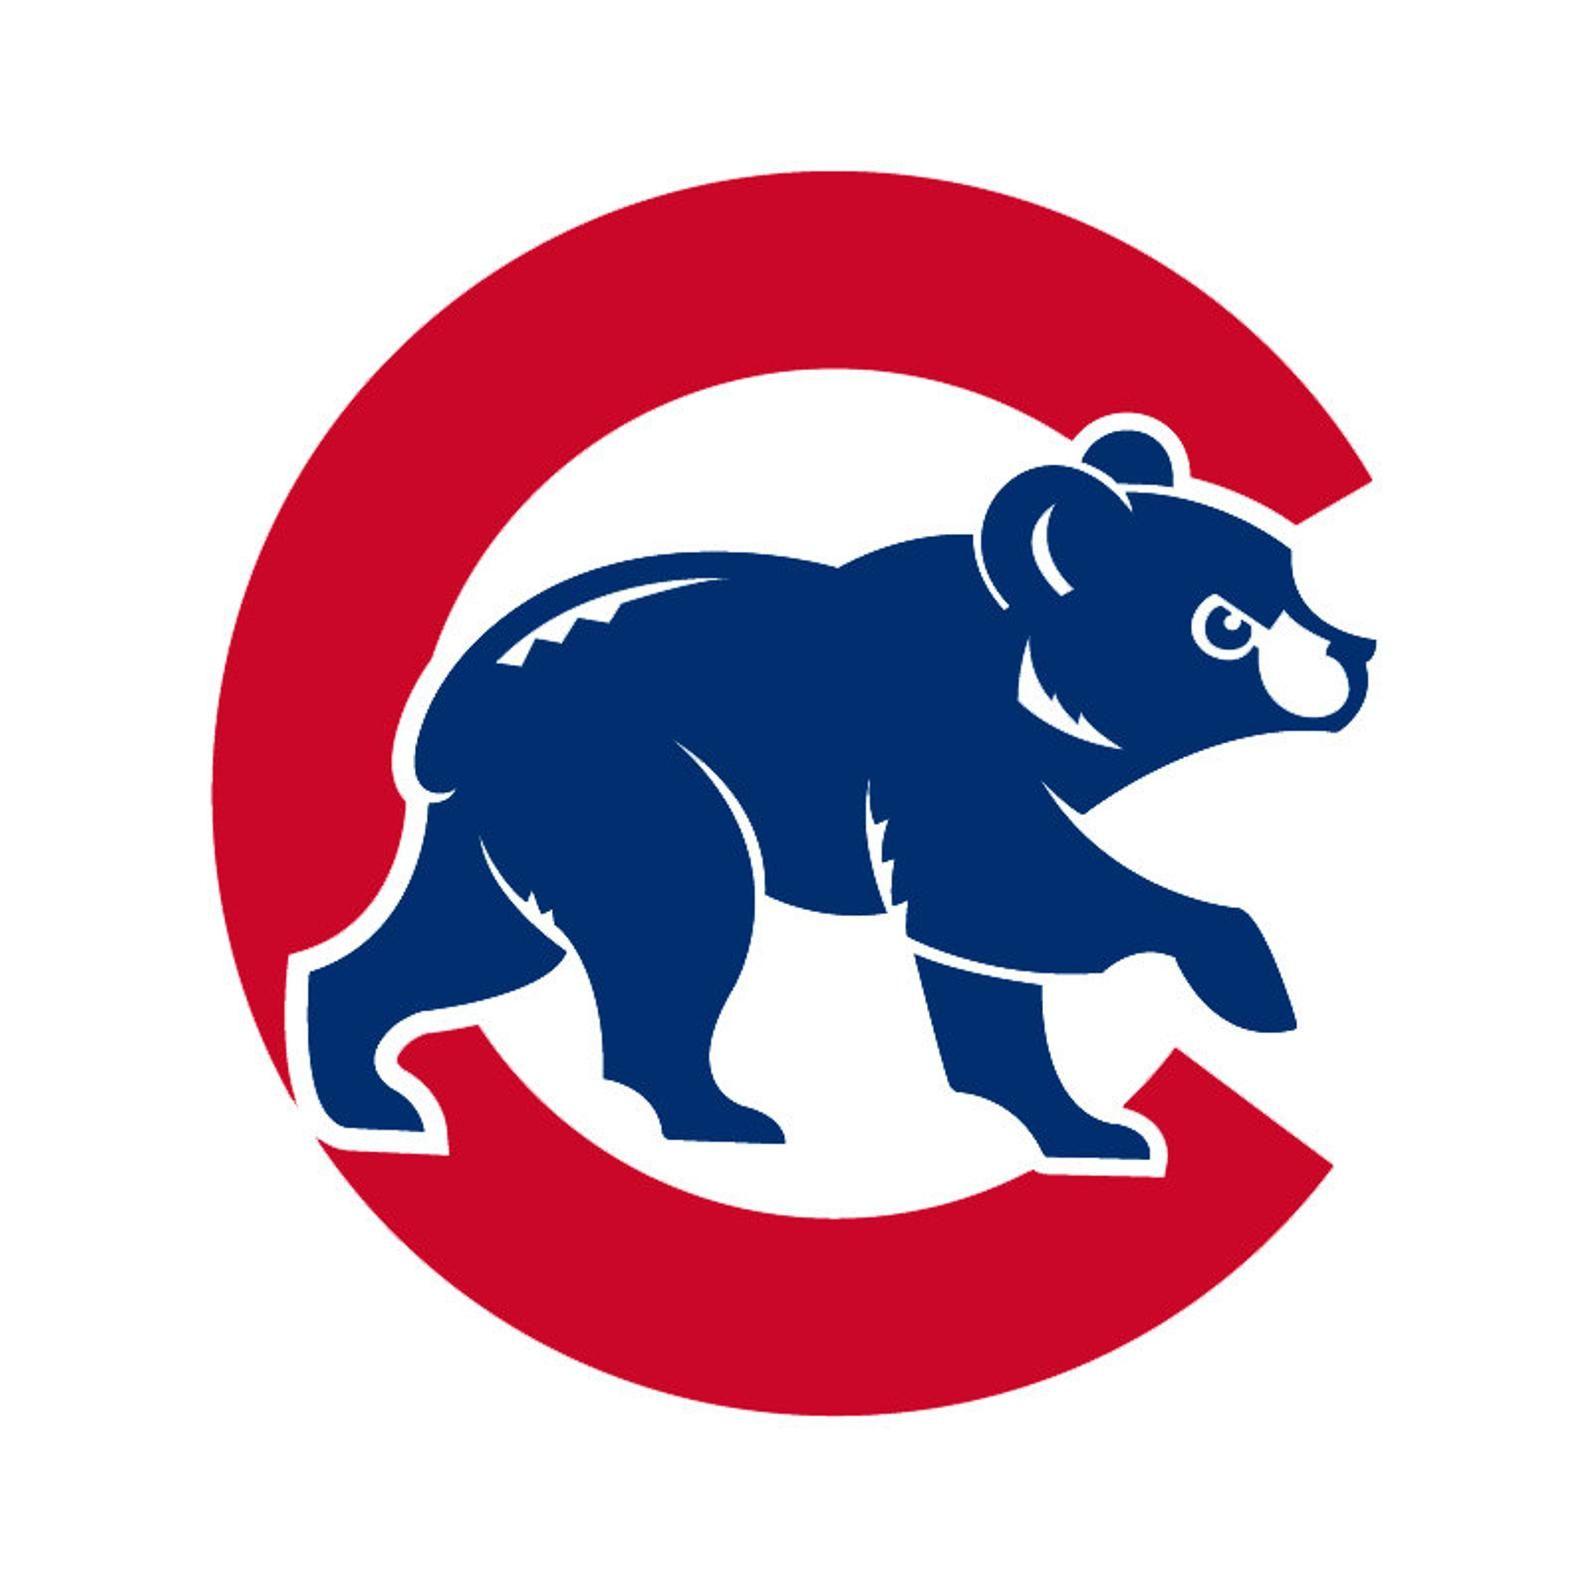 Chicago Cubs Mlb Logo Svg Eps Ai Png Jpg Pdf Chicago Etsy In 2021 Chicago Cubs Wallpaper Chicago Cubs Tattoo Chicago Cubs Crafts